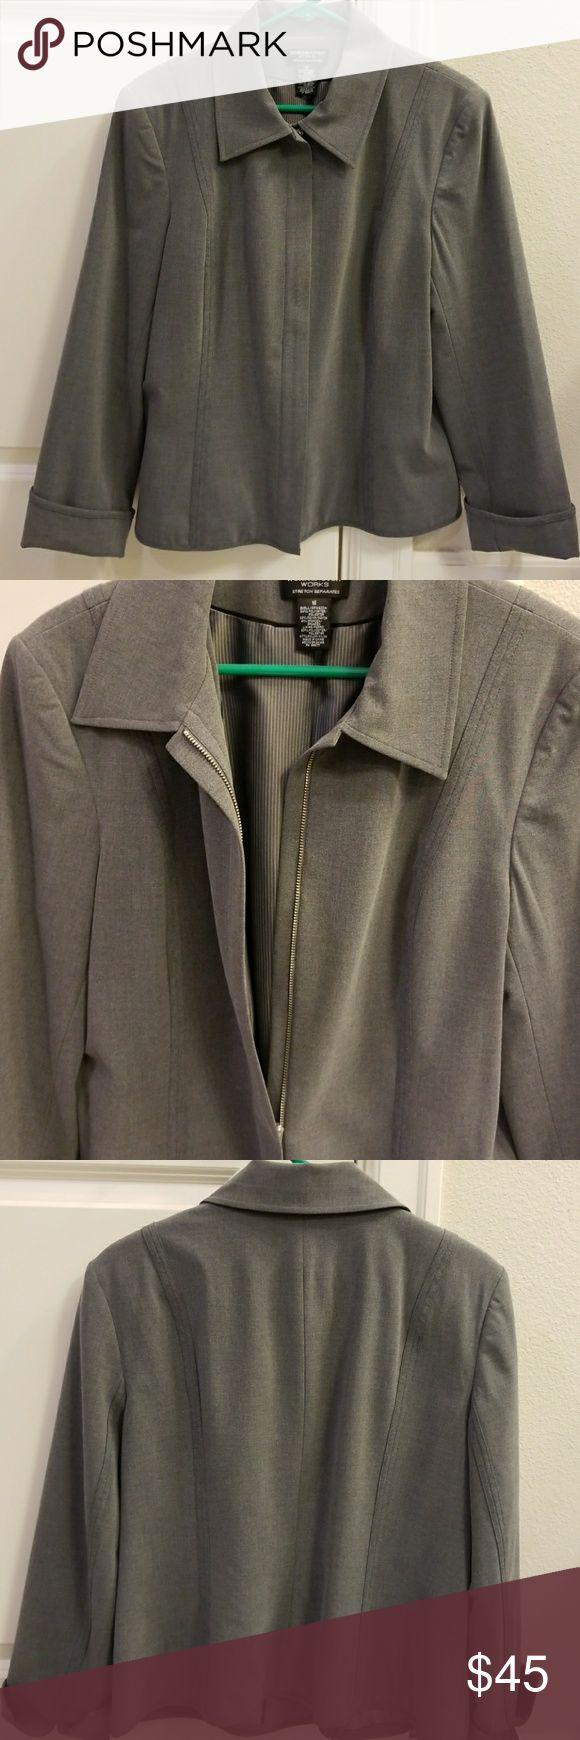 Heather Gray Blazer Very professional heather gray zip up dress jacket/blazer.  Excellent condition! Striped lining, zippered front, folding sleeves. Worthington Jackets & Coats Blazers